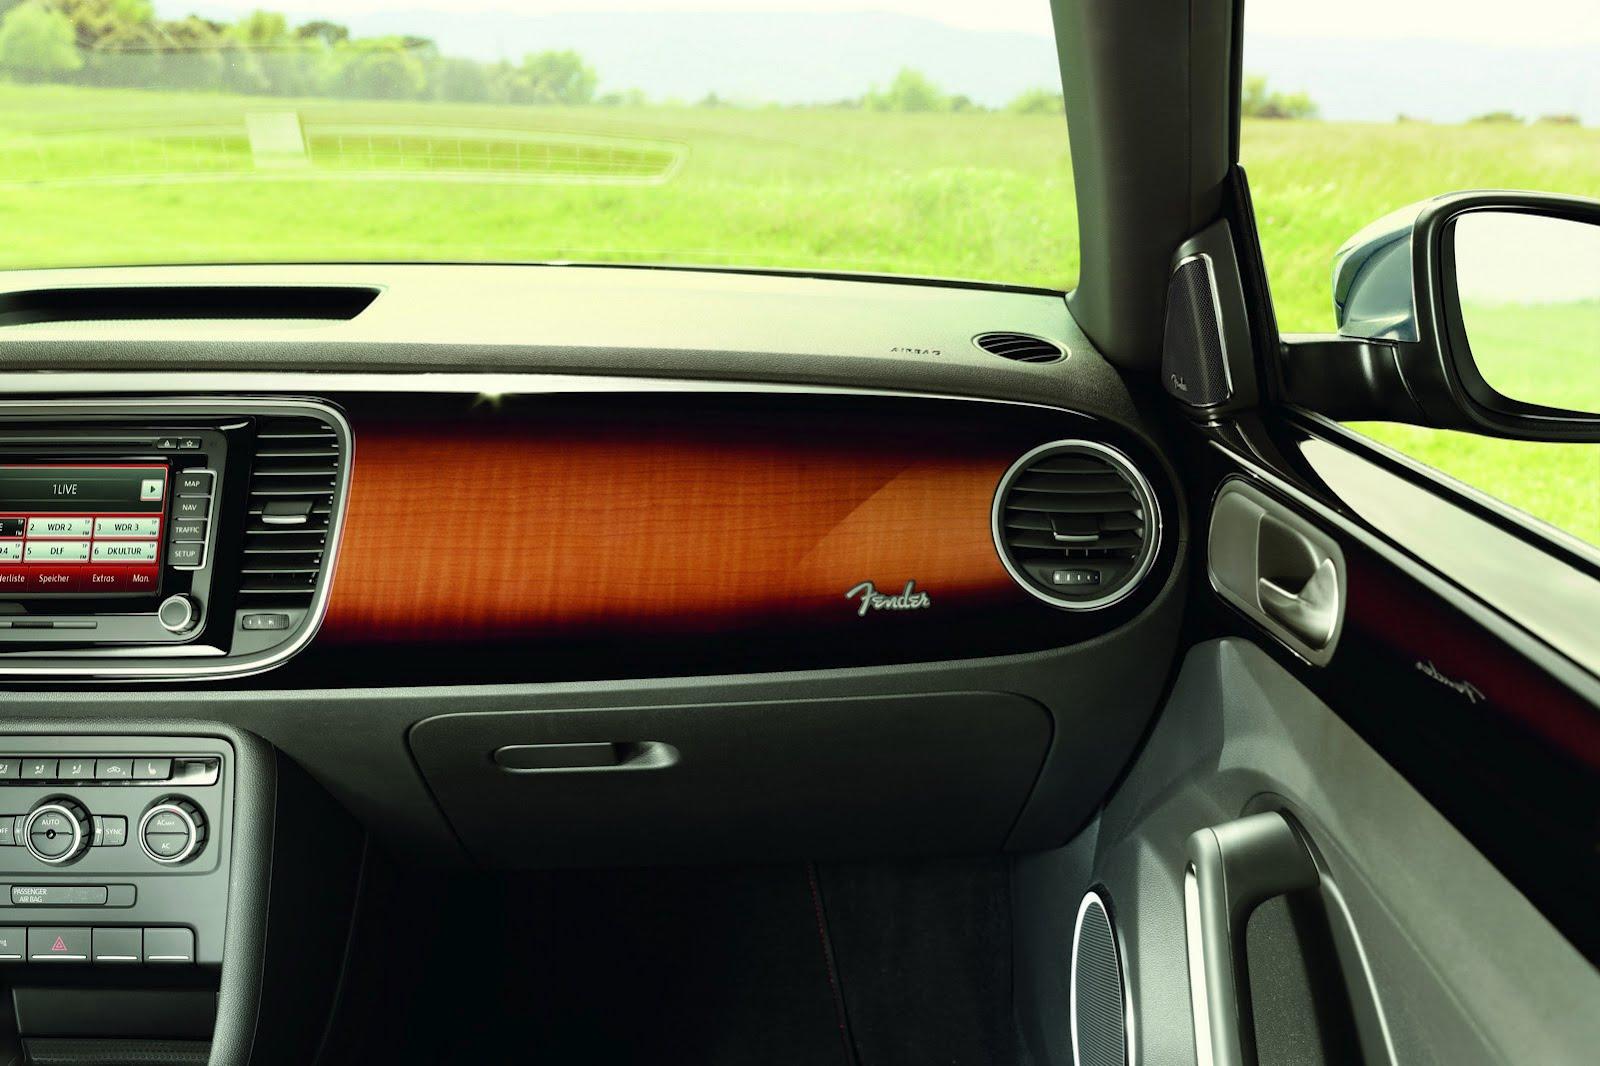 New Car Design Volkswagen Beetle Fender Edition